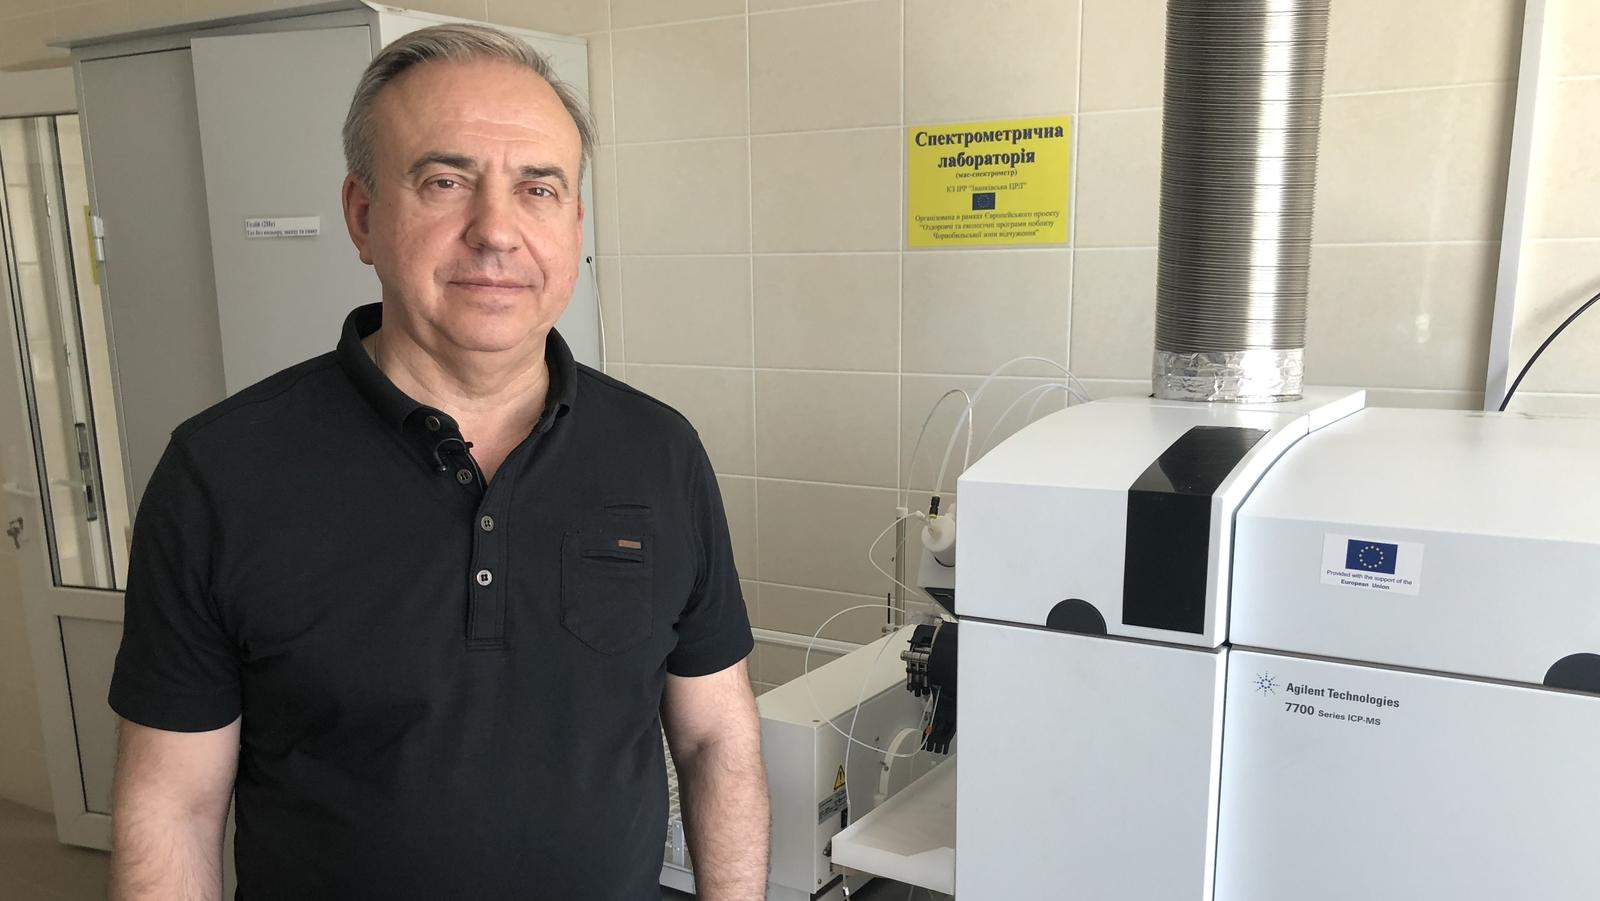 Image - Professor Yury Bandashevsky in his lab